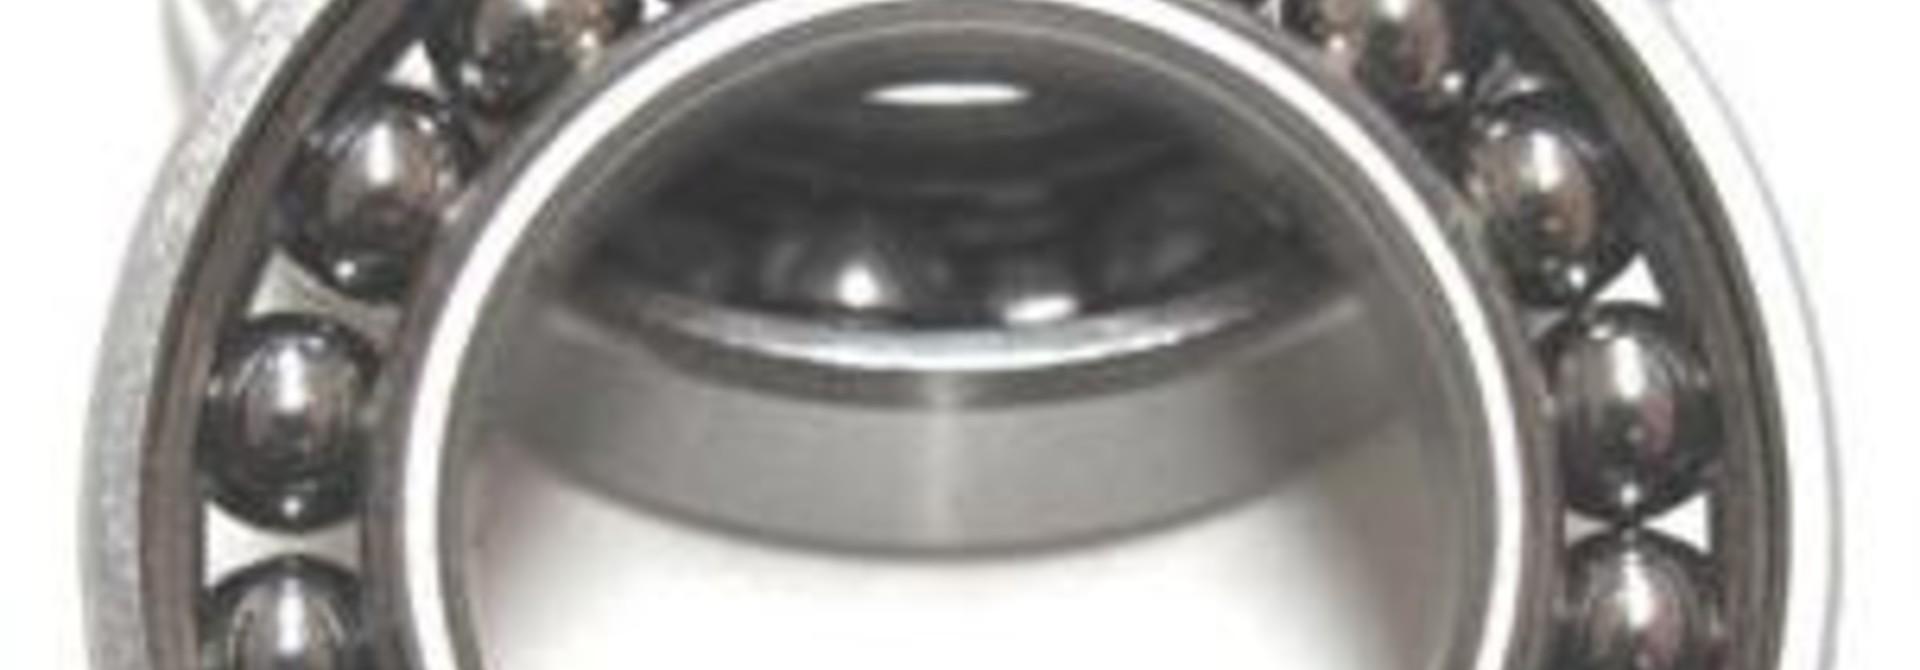 Enduro 6804 MAX Steel Bearing /each (20x32x7mm)